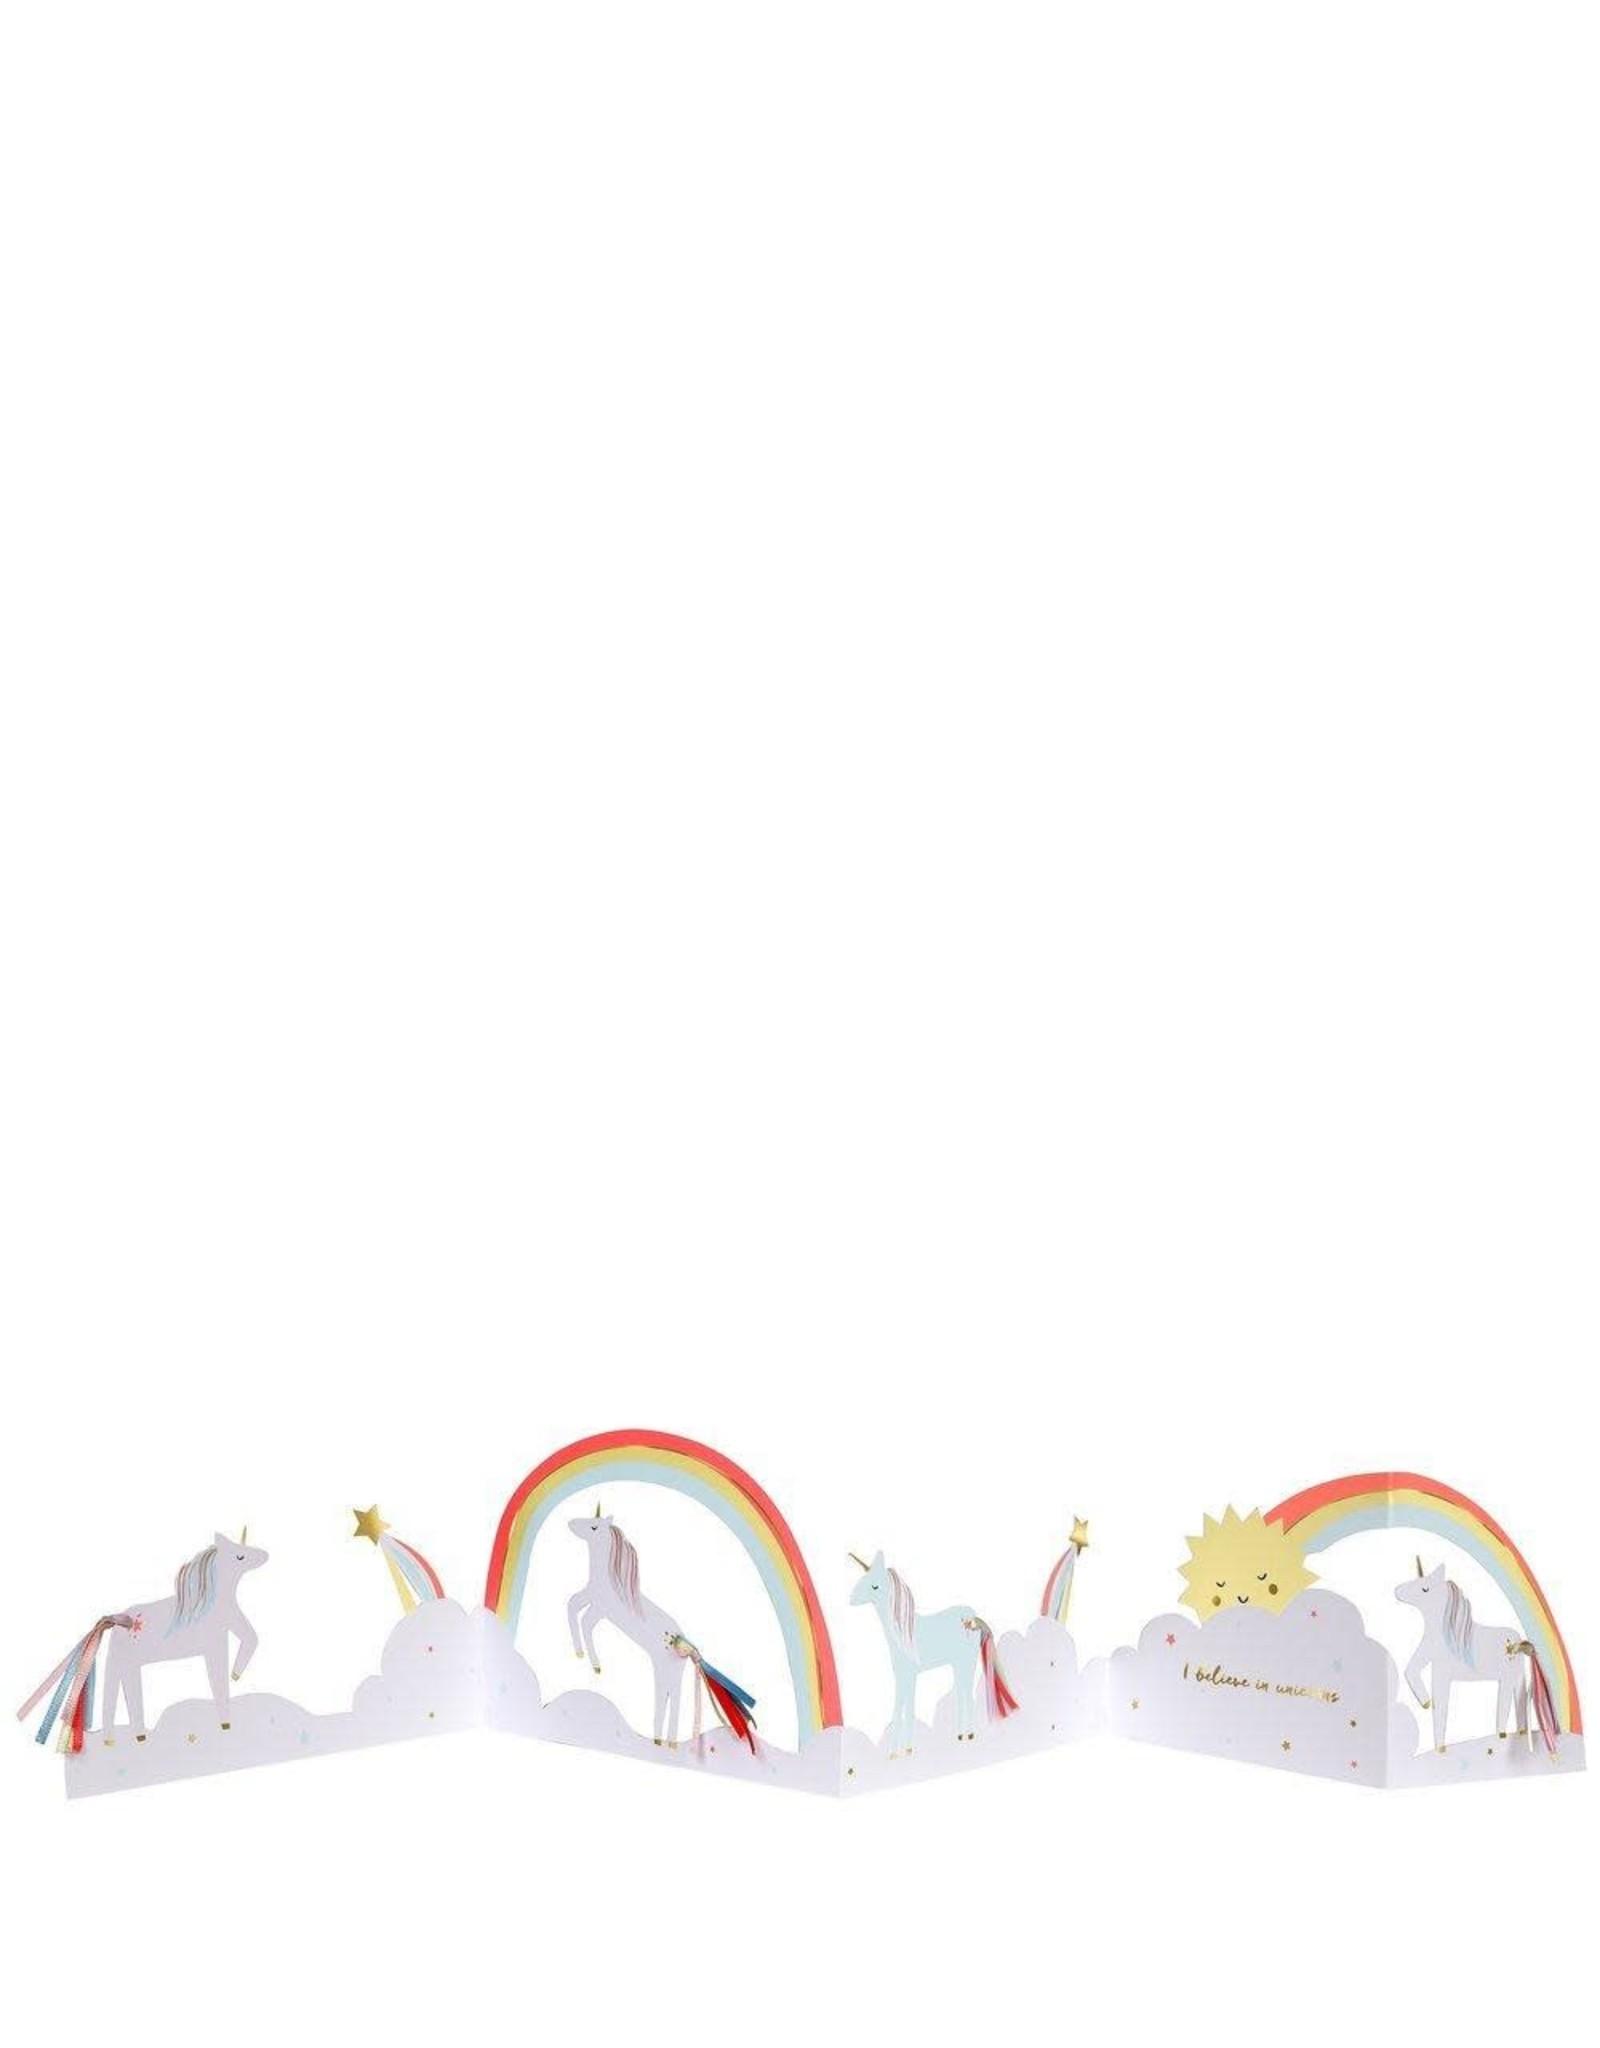 Meri Meri Wenskaart - Unicorn - Concertina + envelop - 13,5 x 18,5 - Happy Birthday